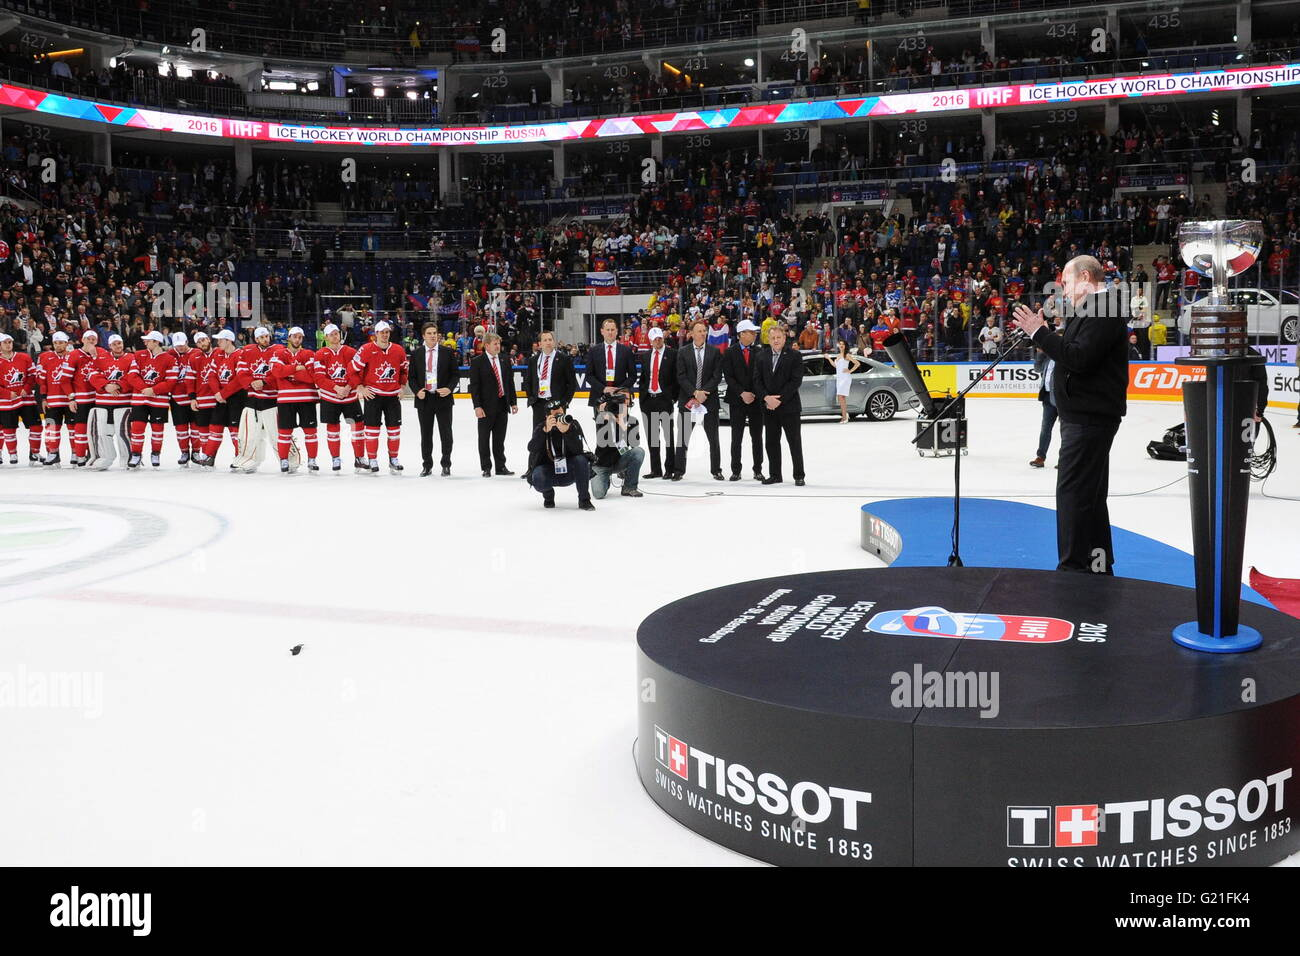 Russia's President Vladimir Putin (R) speaks during an awards ceremony following the 2016 IIHF World Championship Stock Photo